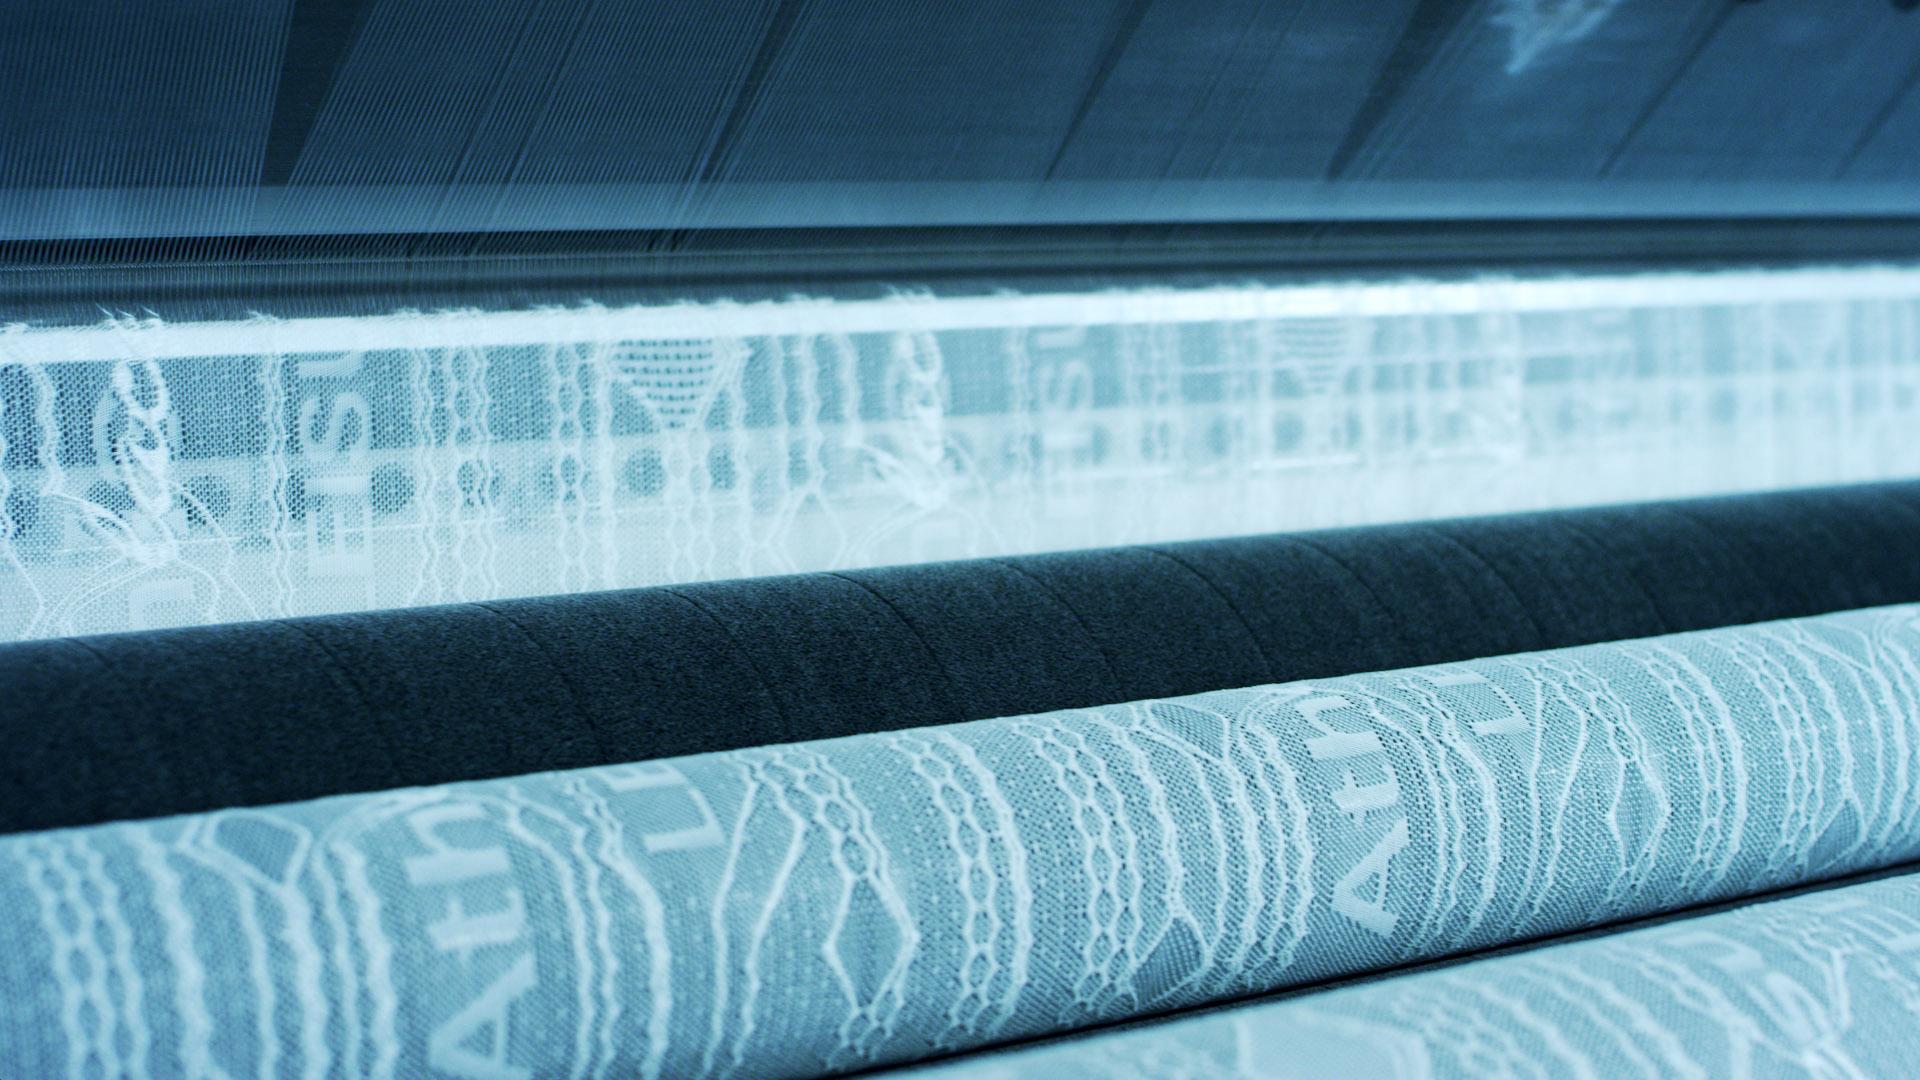 Karl-Mayer-Texture-Machine-Production-Textile_17.jpg